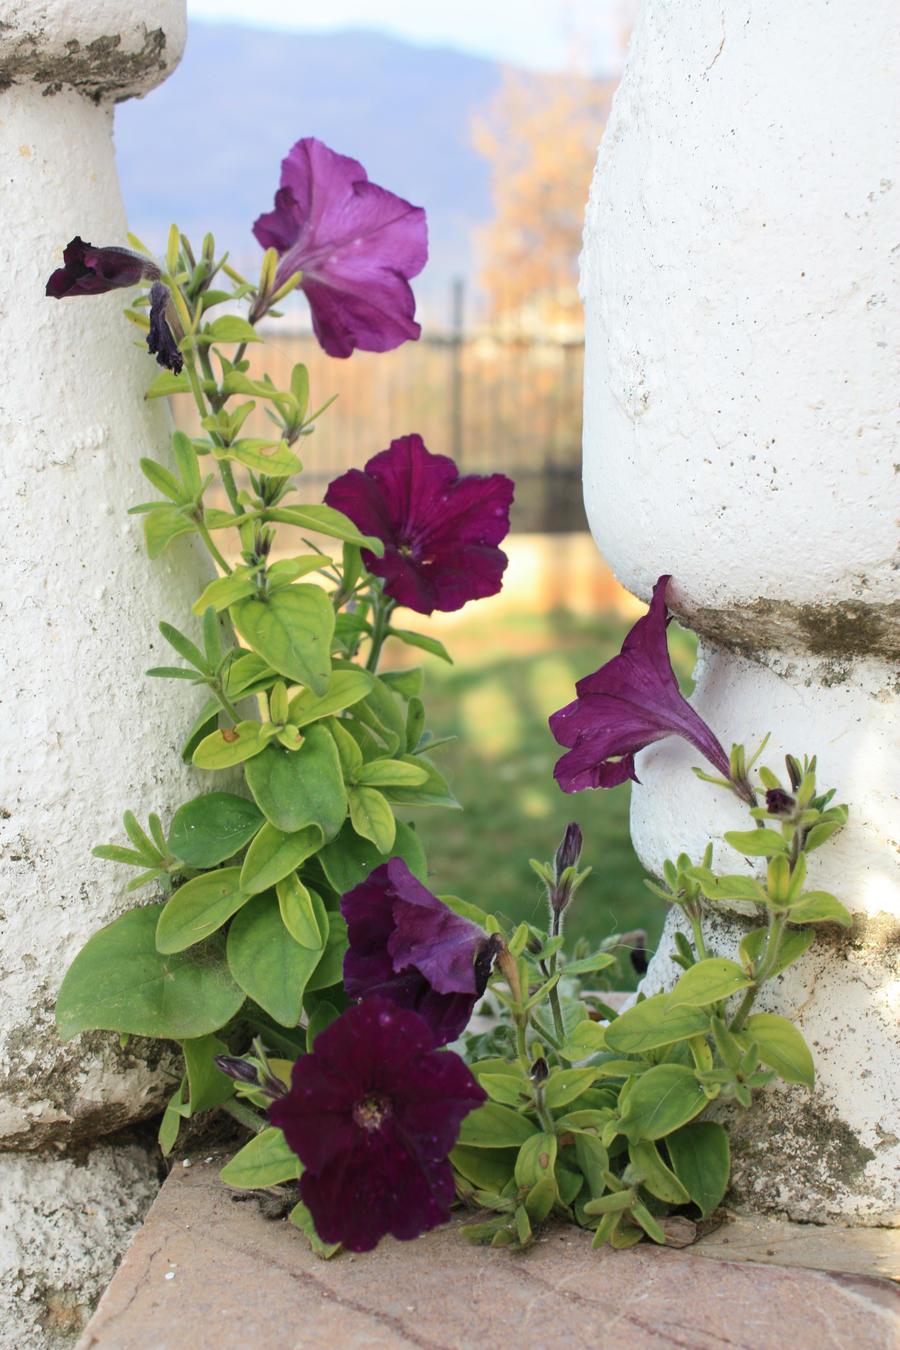 lule ne Diber by ReBurton